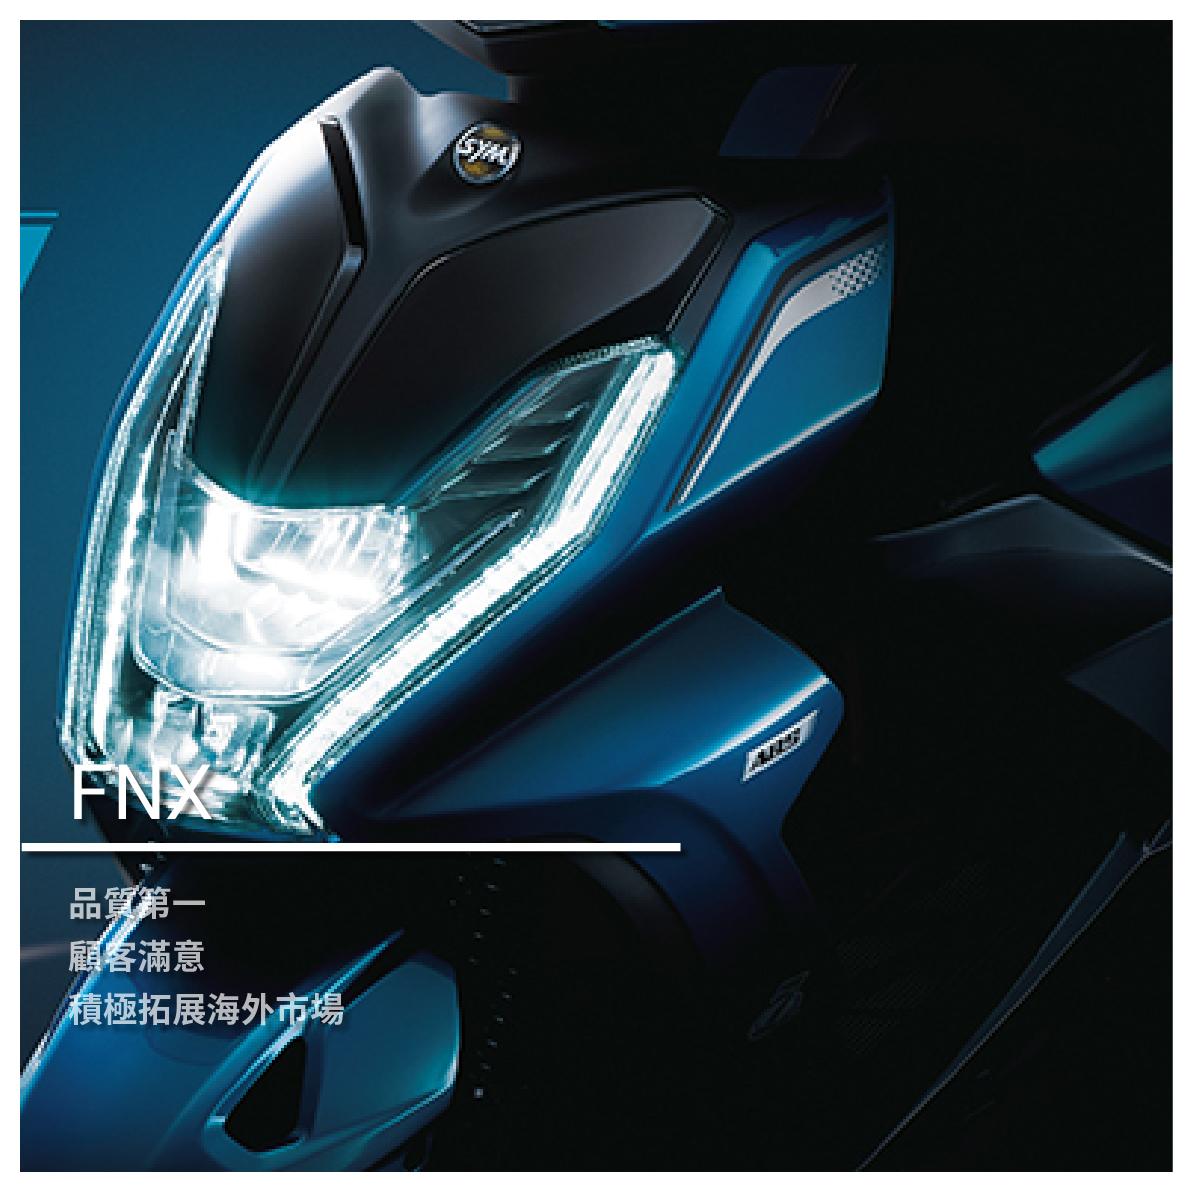 【鋐安車業】SYM 三陽系列 FNX